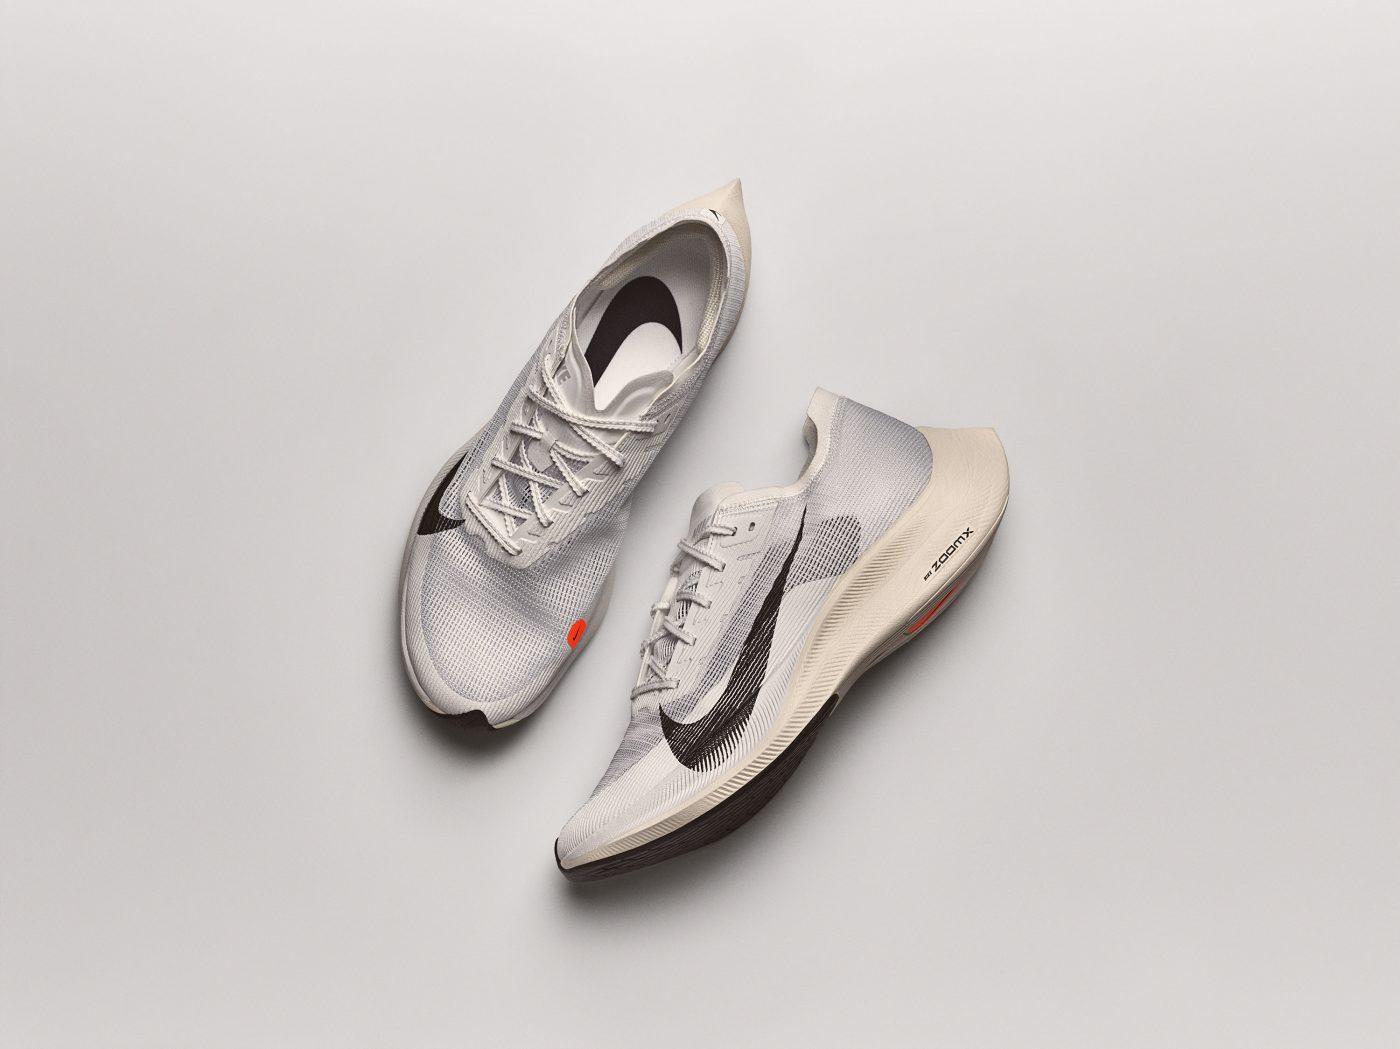 Nike_ZoomX_Vaporfly_NEXT%_12